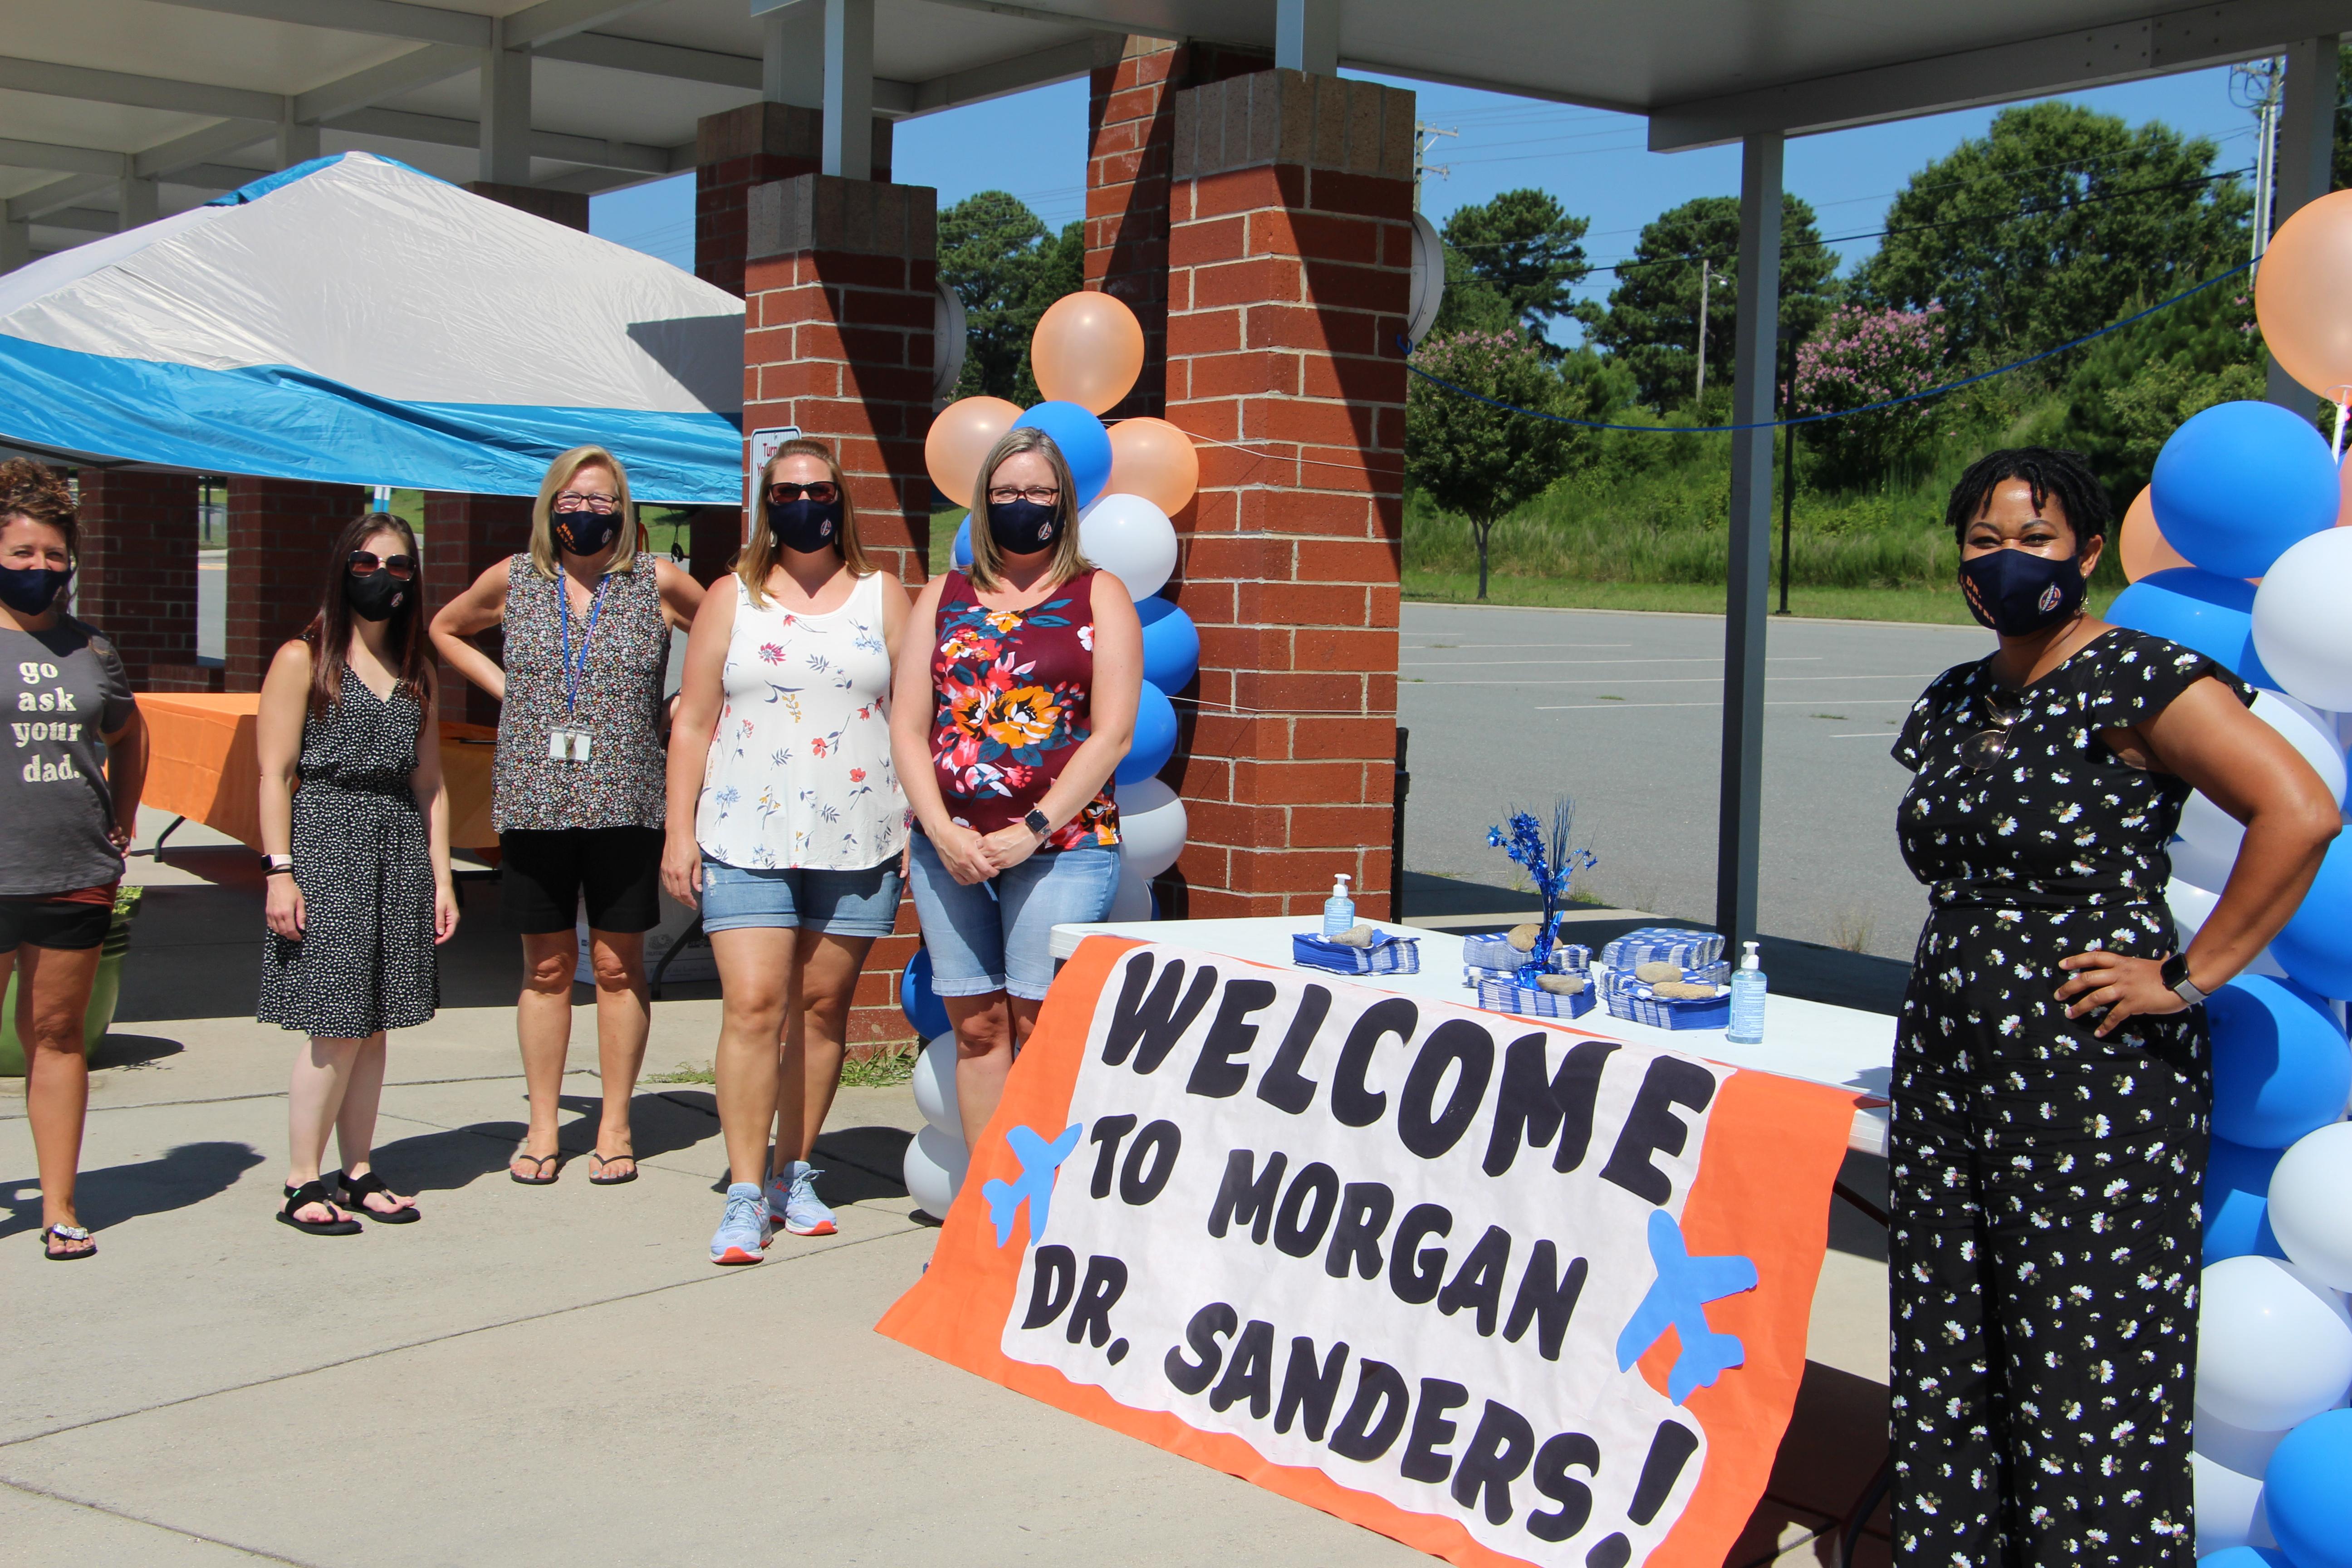 Morgan Elementary School Staff Welcomes New Principal Dr. Stephanie Sanders